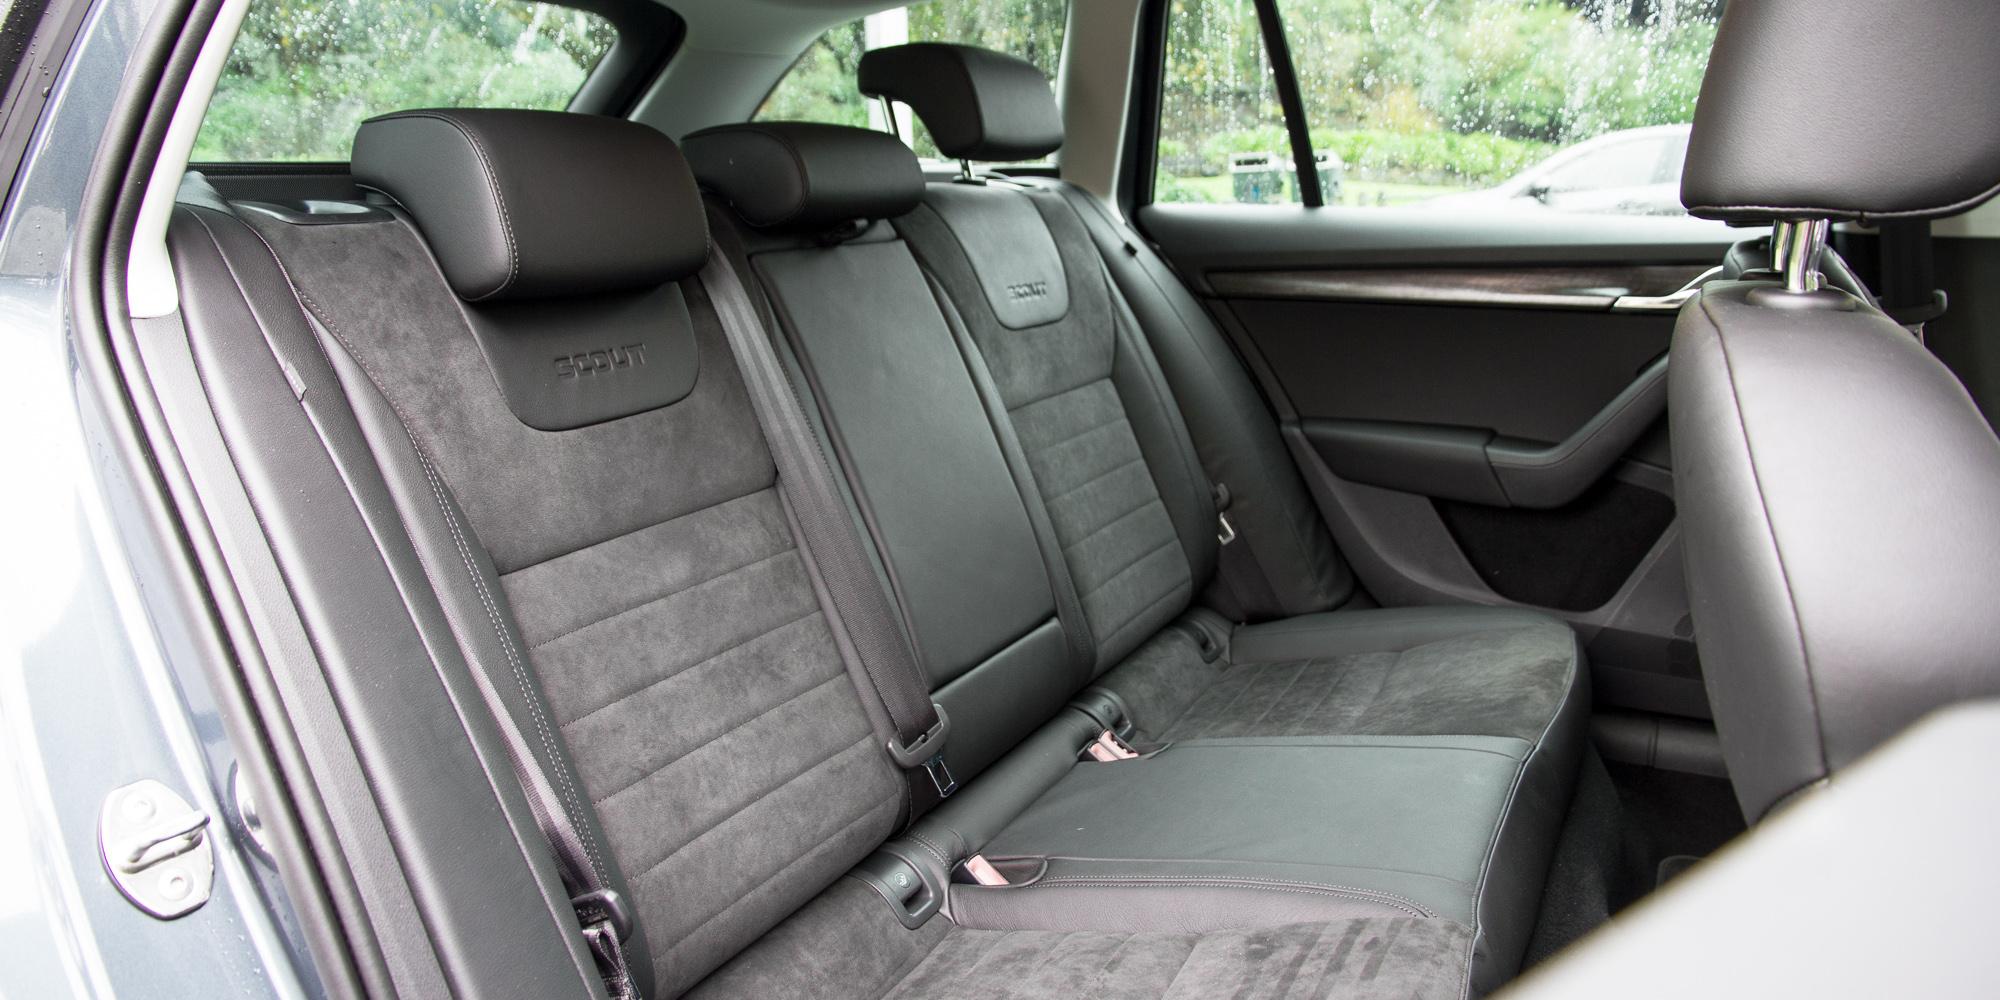 2016 Skoda Octavia Scout Interior Rear Seats